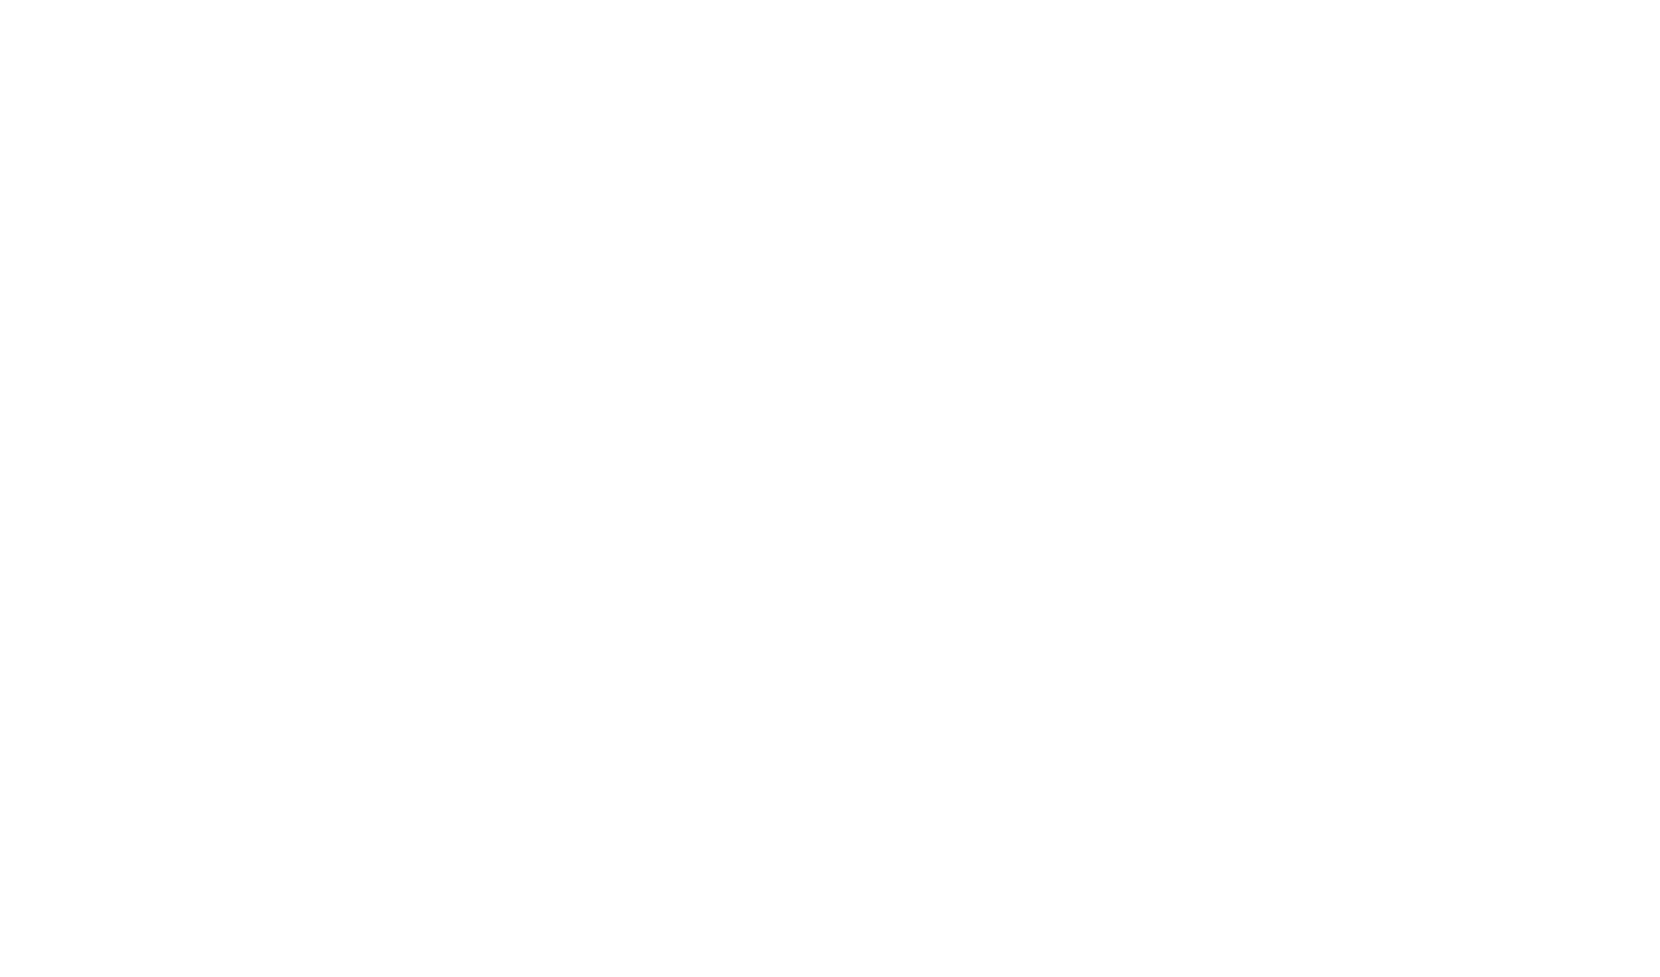 LBTB heroslider 1